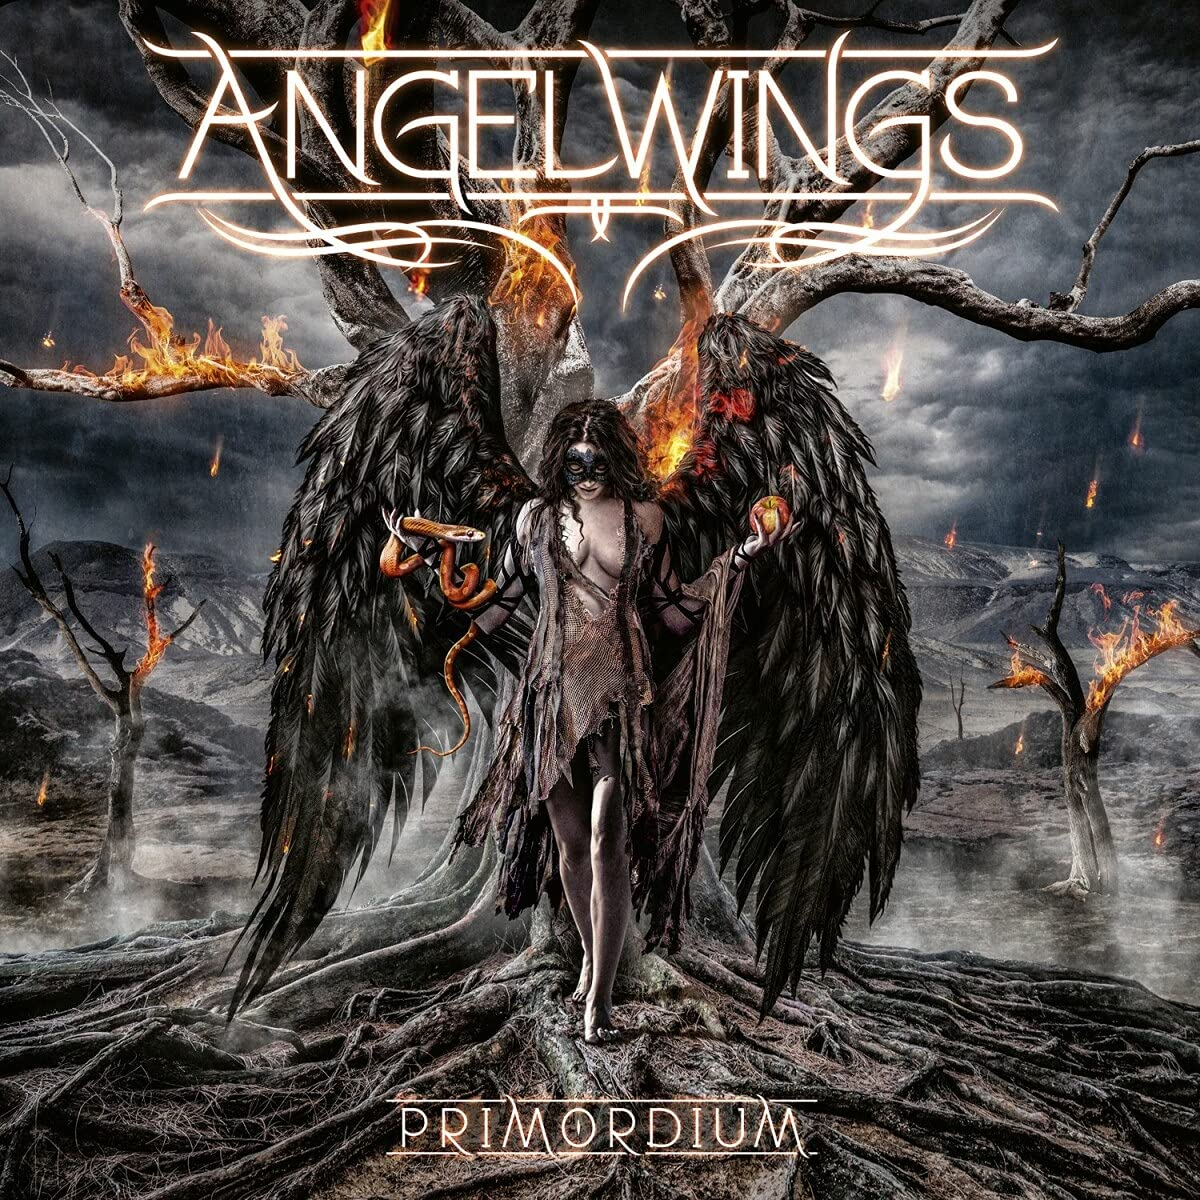 Angelwings - Primordium (2021) [FLAC] Download